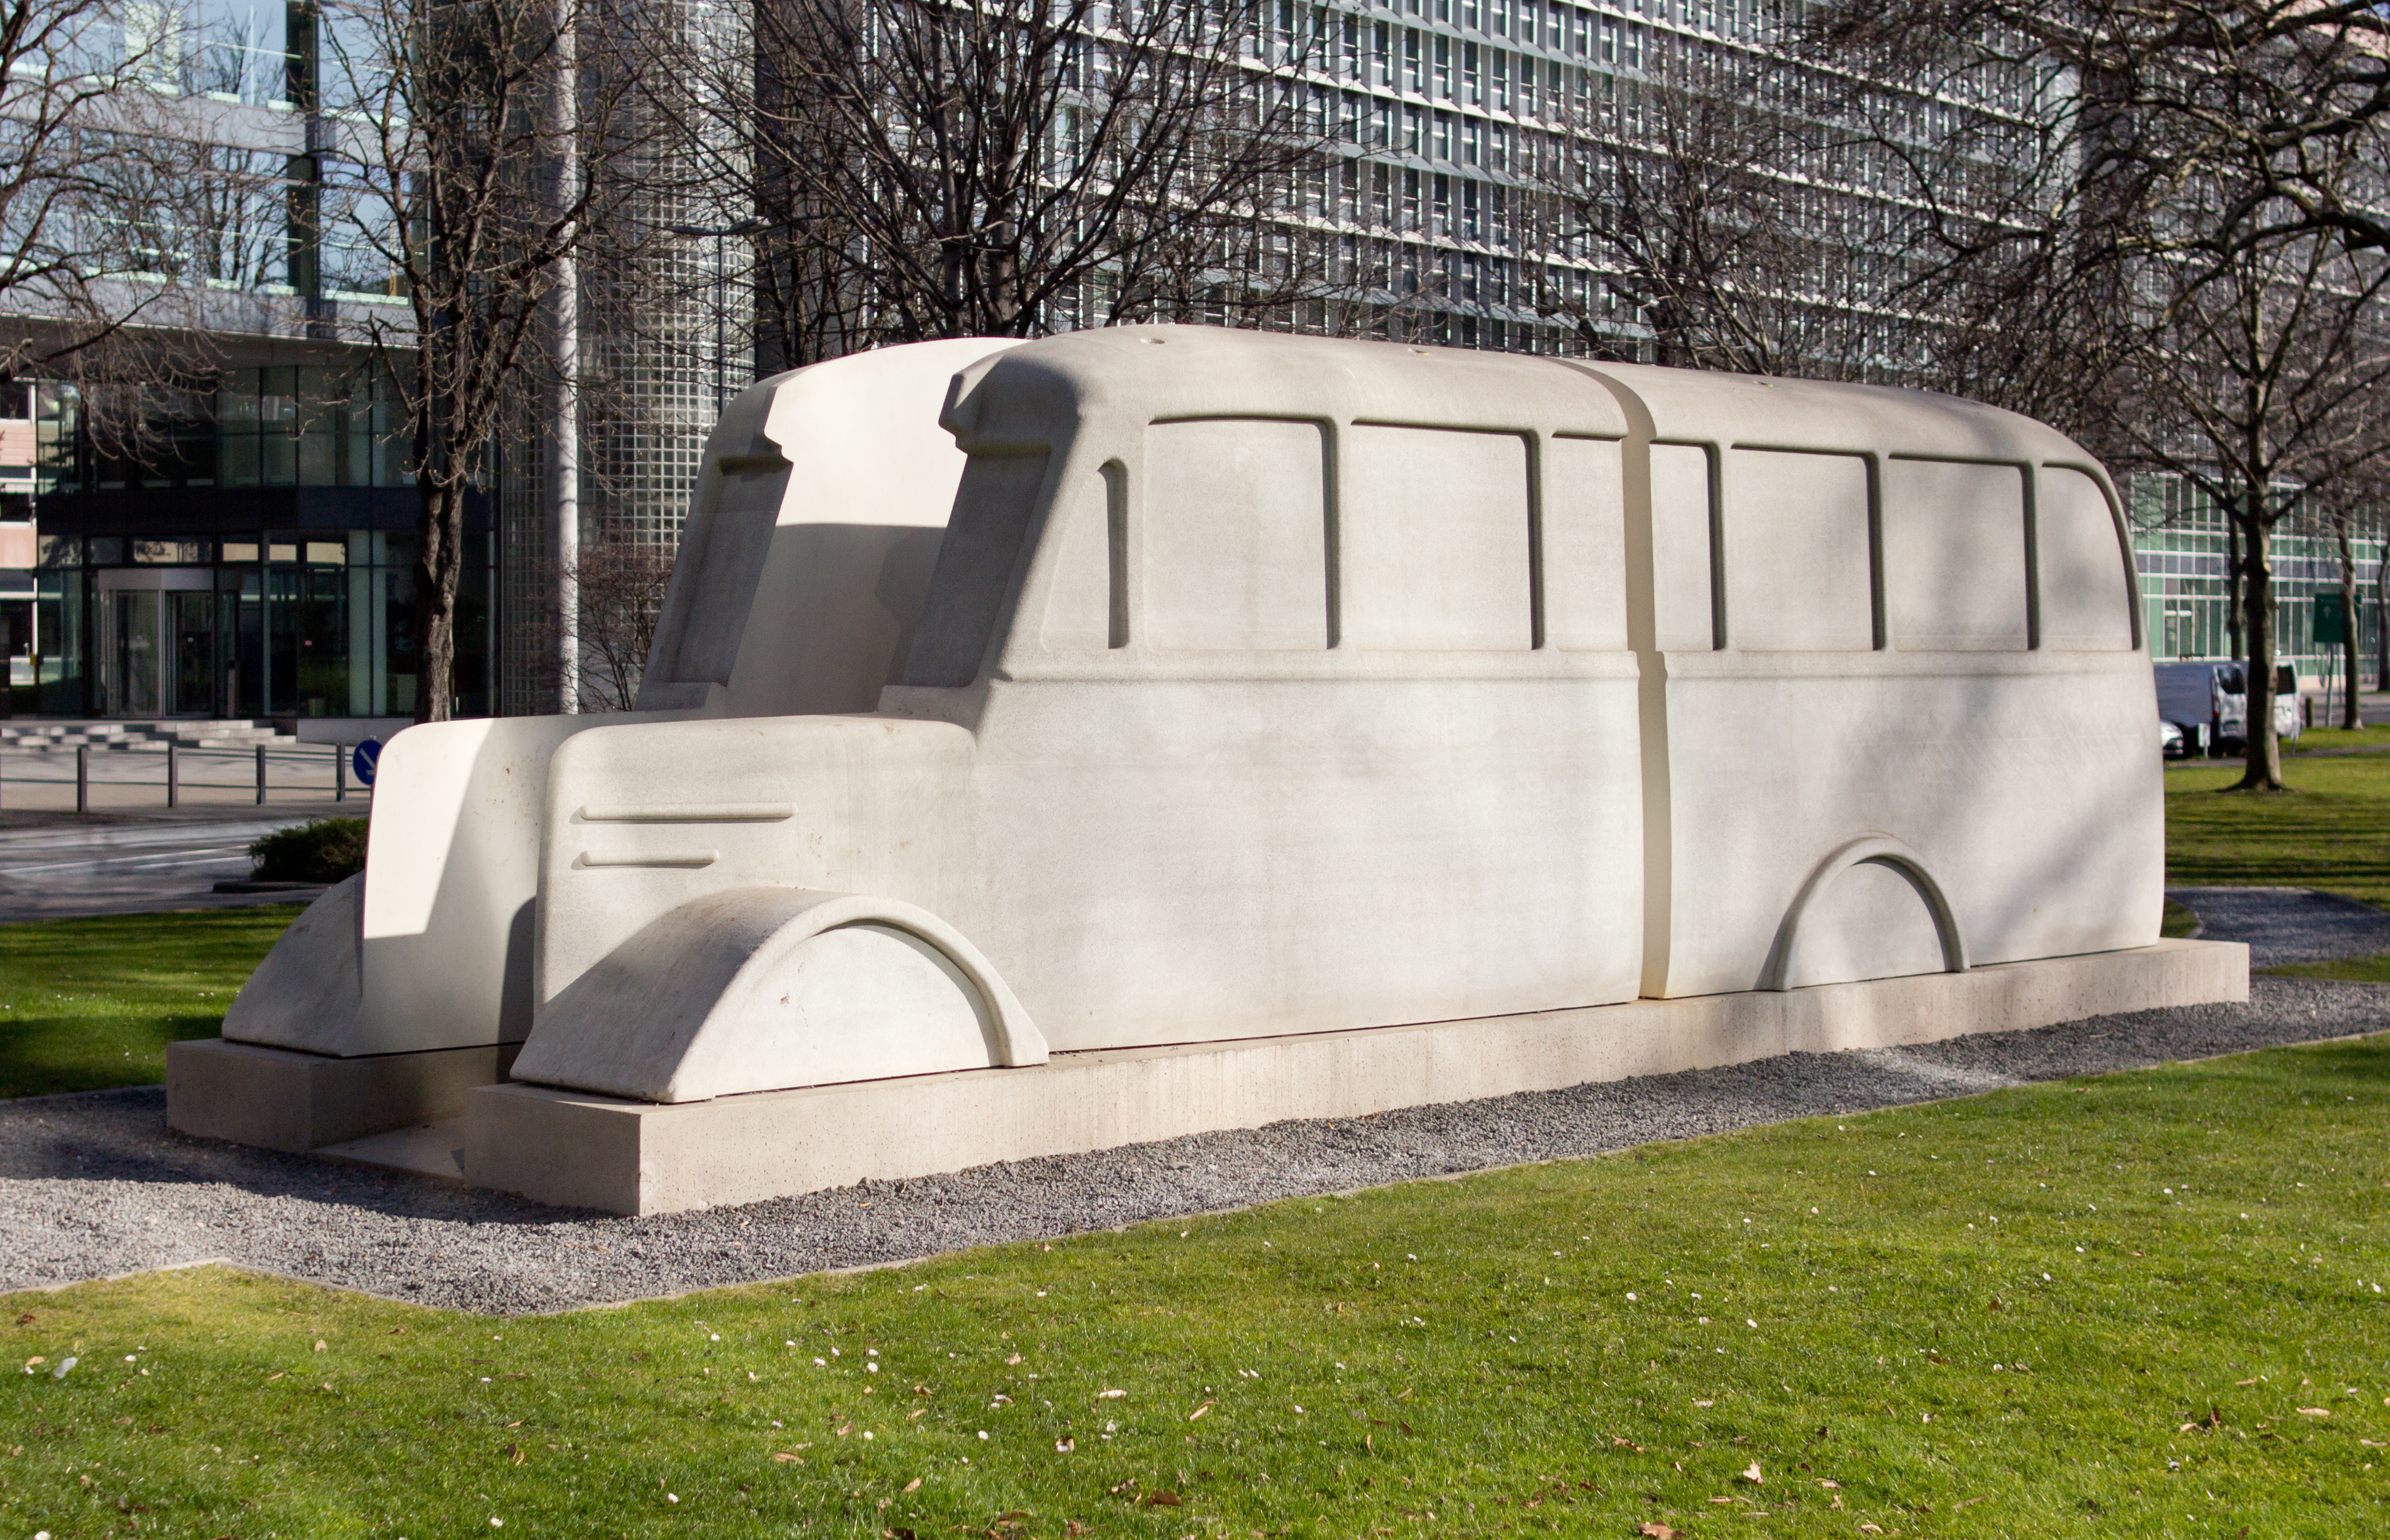 Denkmal der Grauen Busse (Replika Köln)-1.jpg